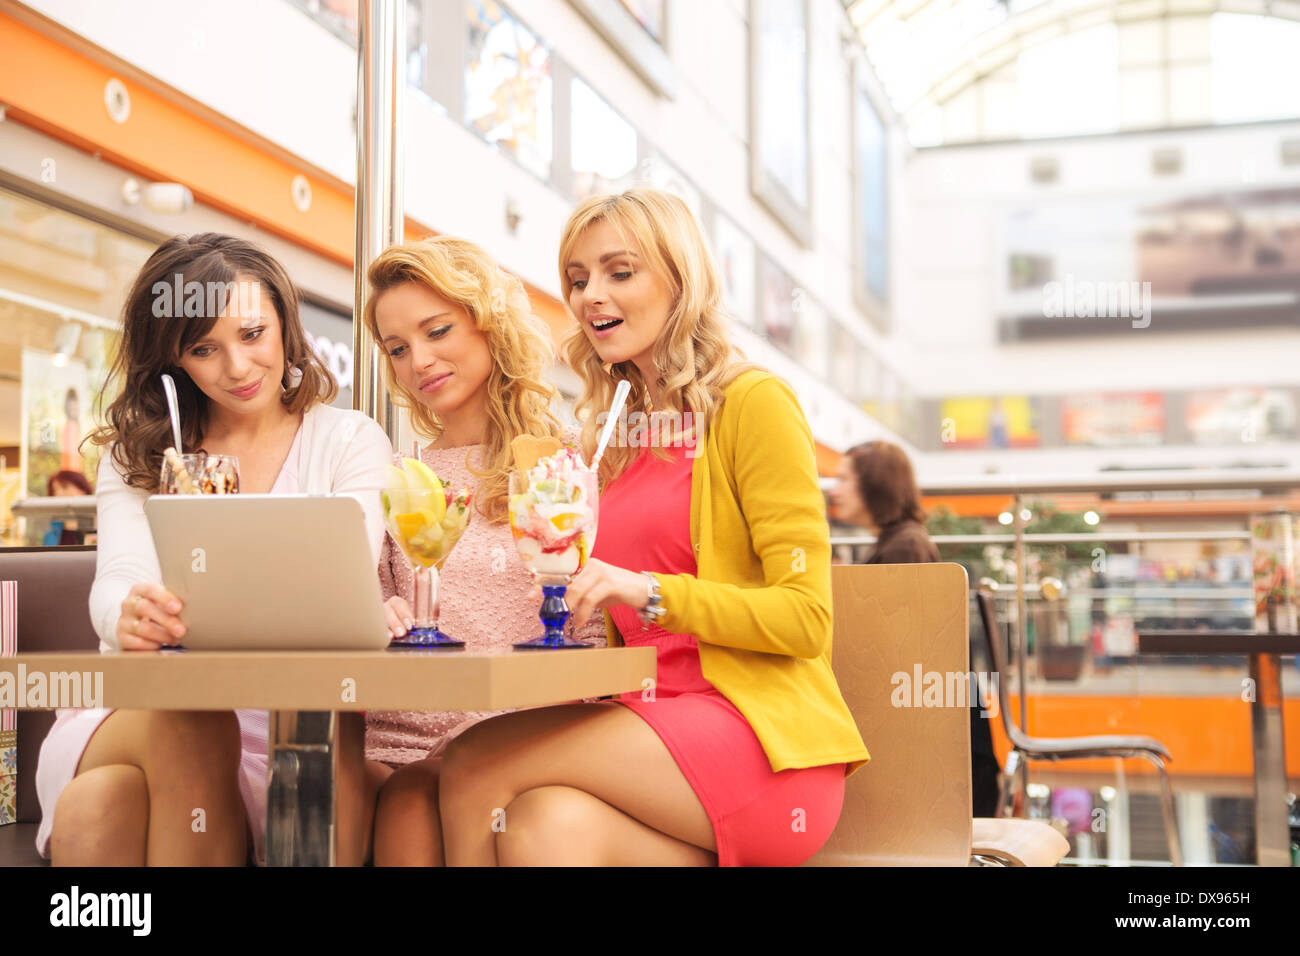 Short break during the shopping day - Stock Image